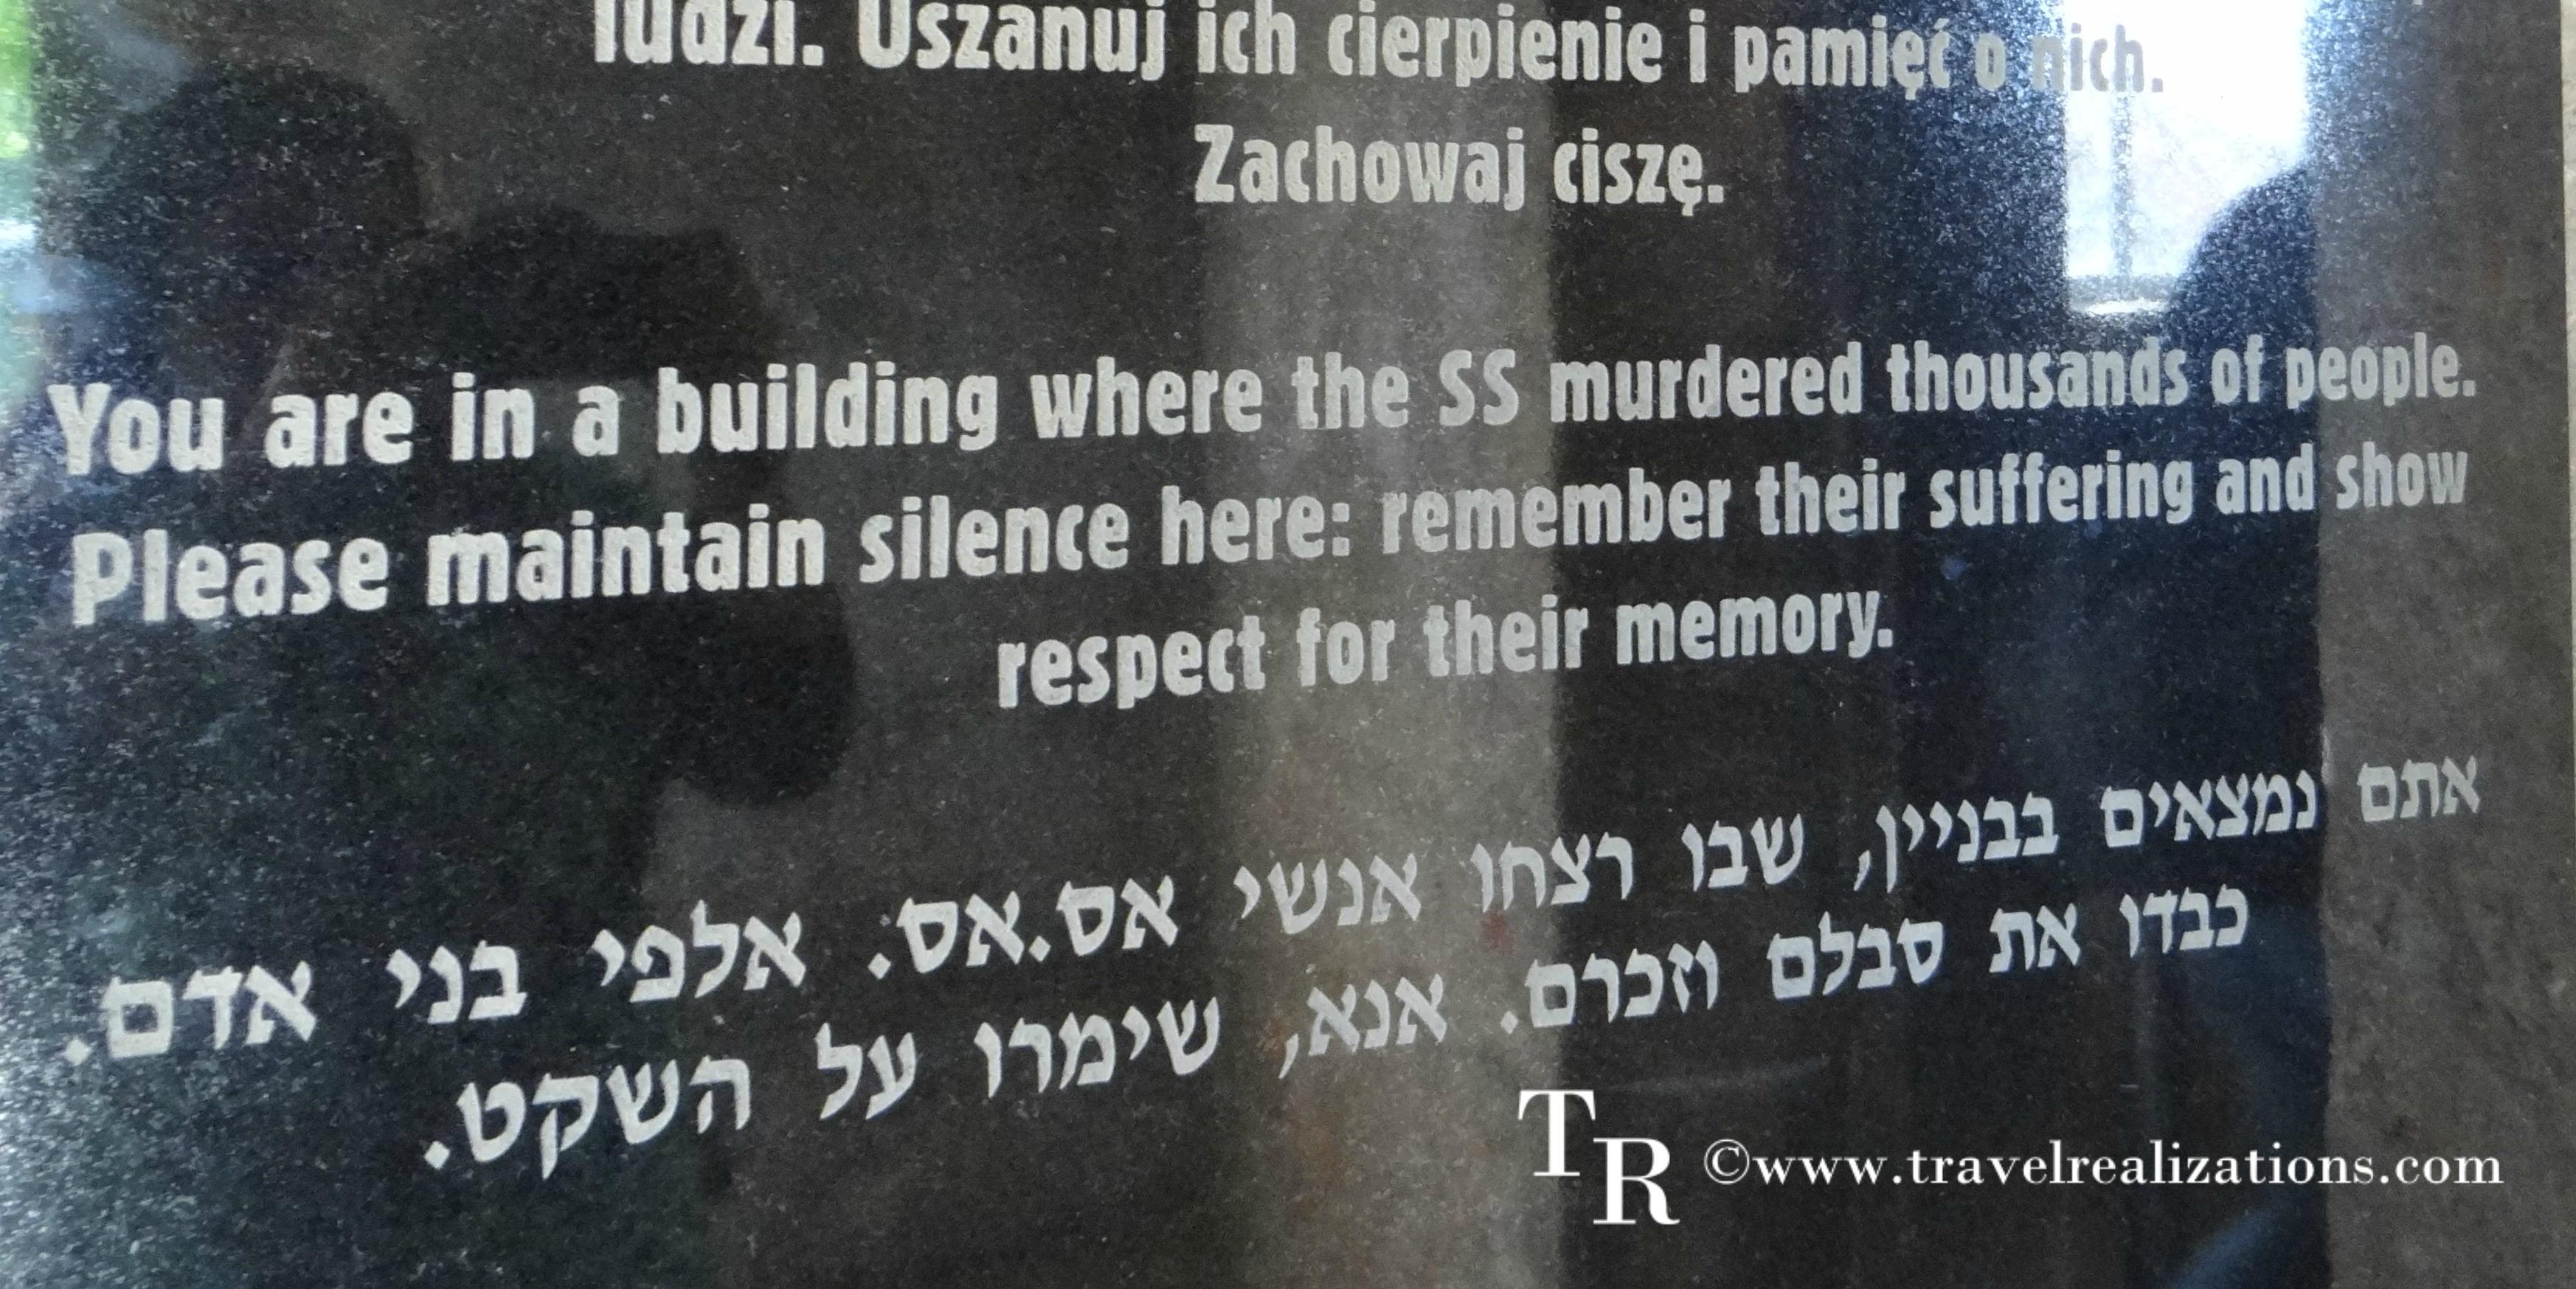 The tragic road of death in Auschwitz, Poland !